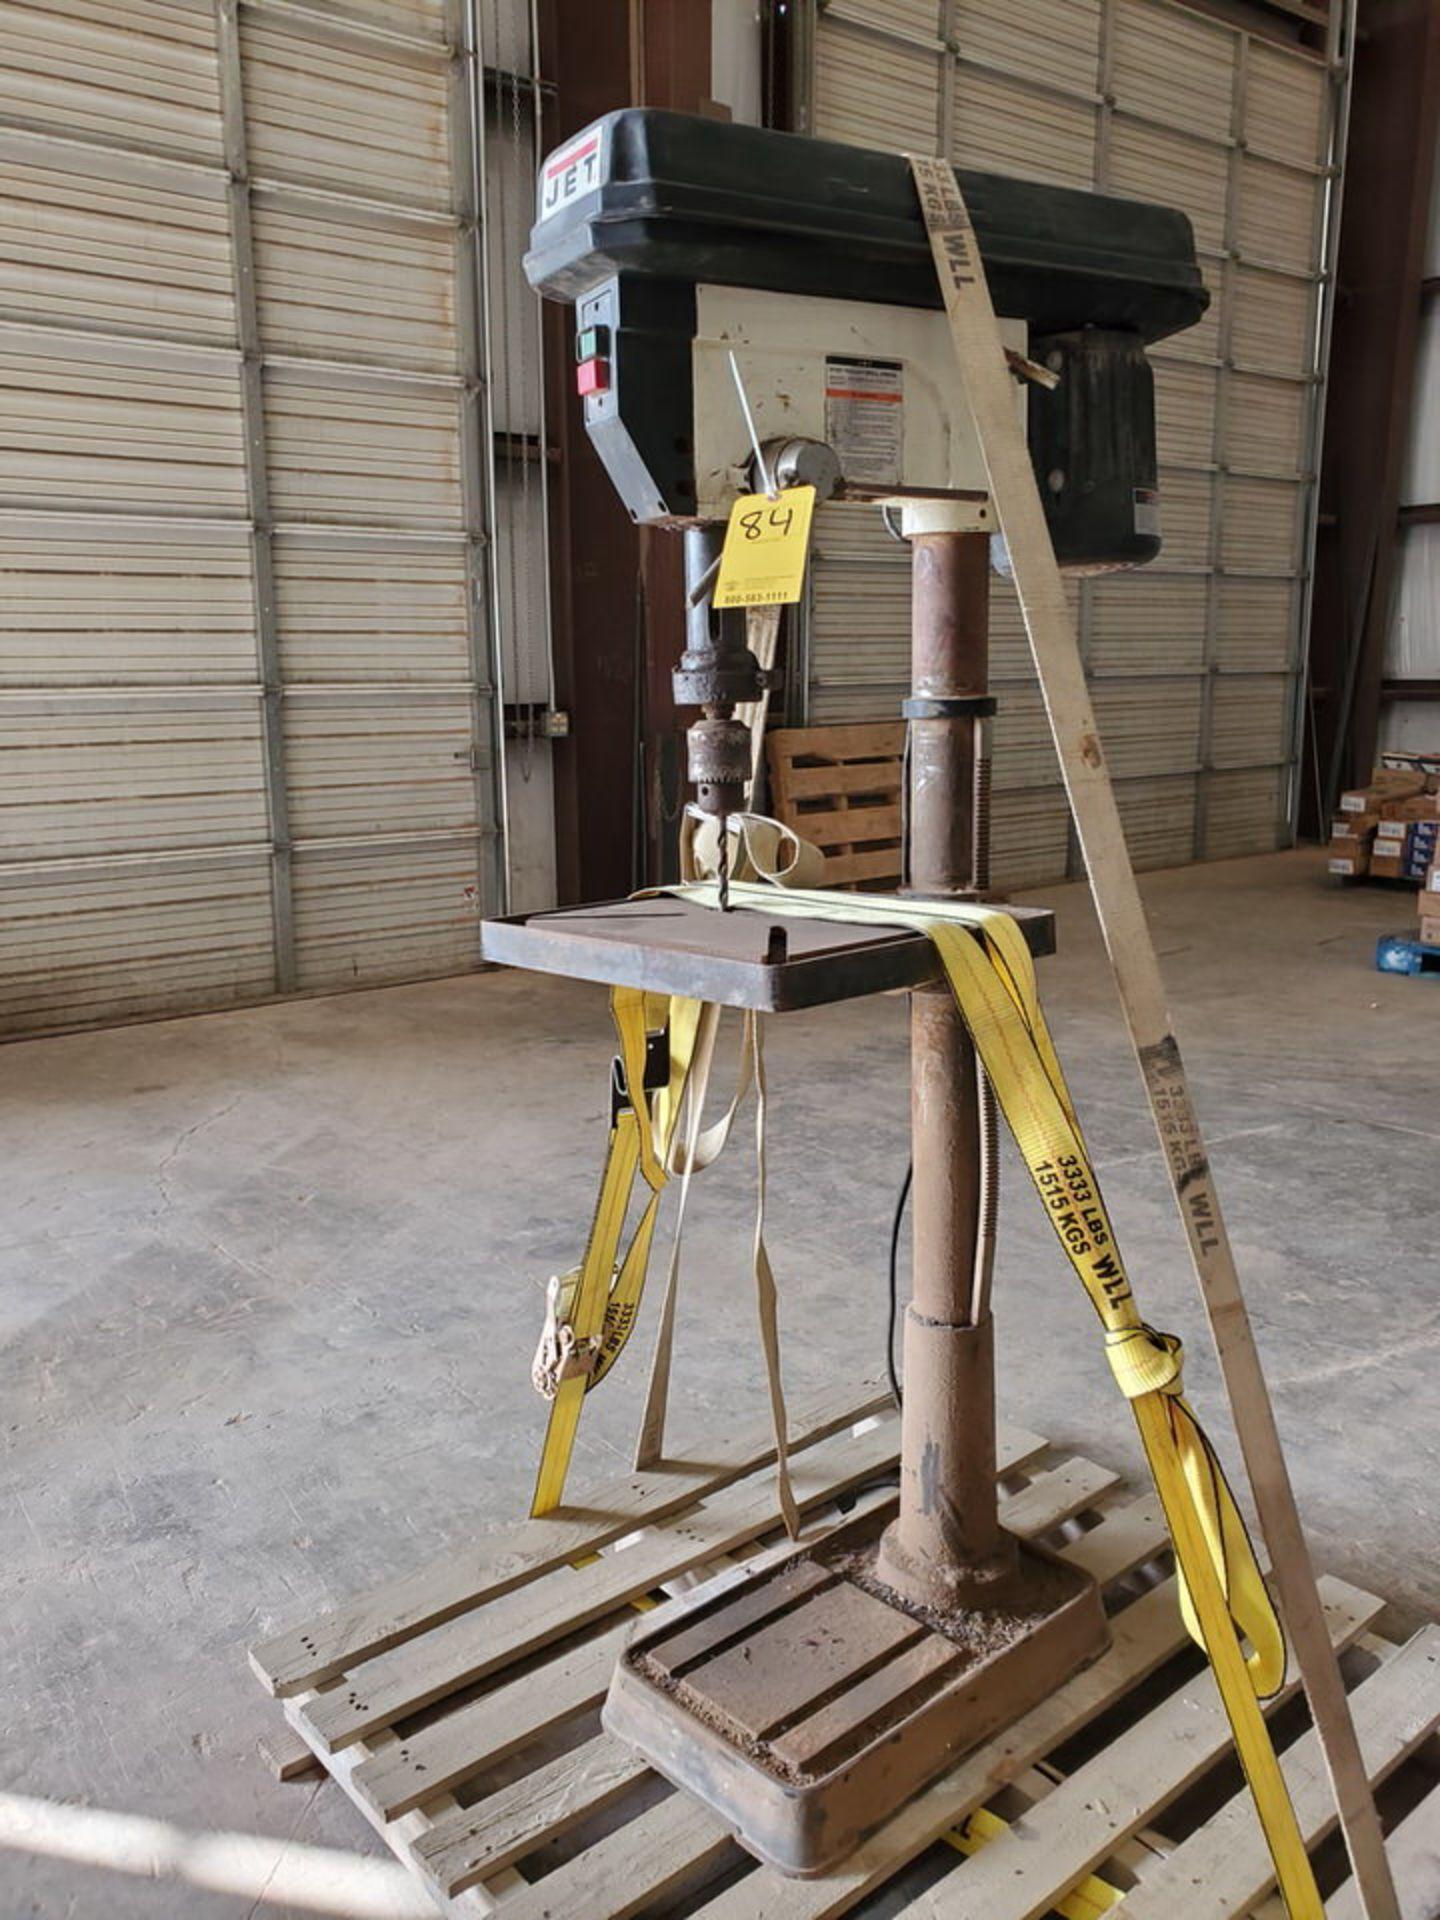 "JDP-20MF 20"" Drill Press 115/230V, 1-1/2HP, 1720RPM, 1"" Drilling Cap.; 16"" x 18"" Work Table - Image 3 of 8"